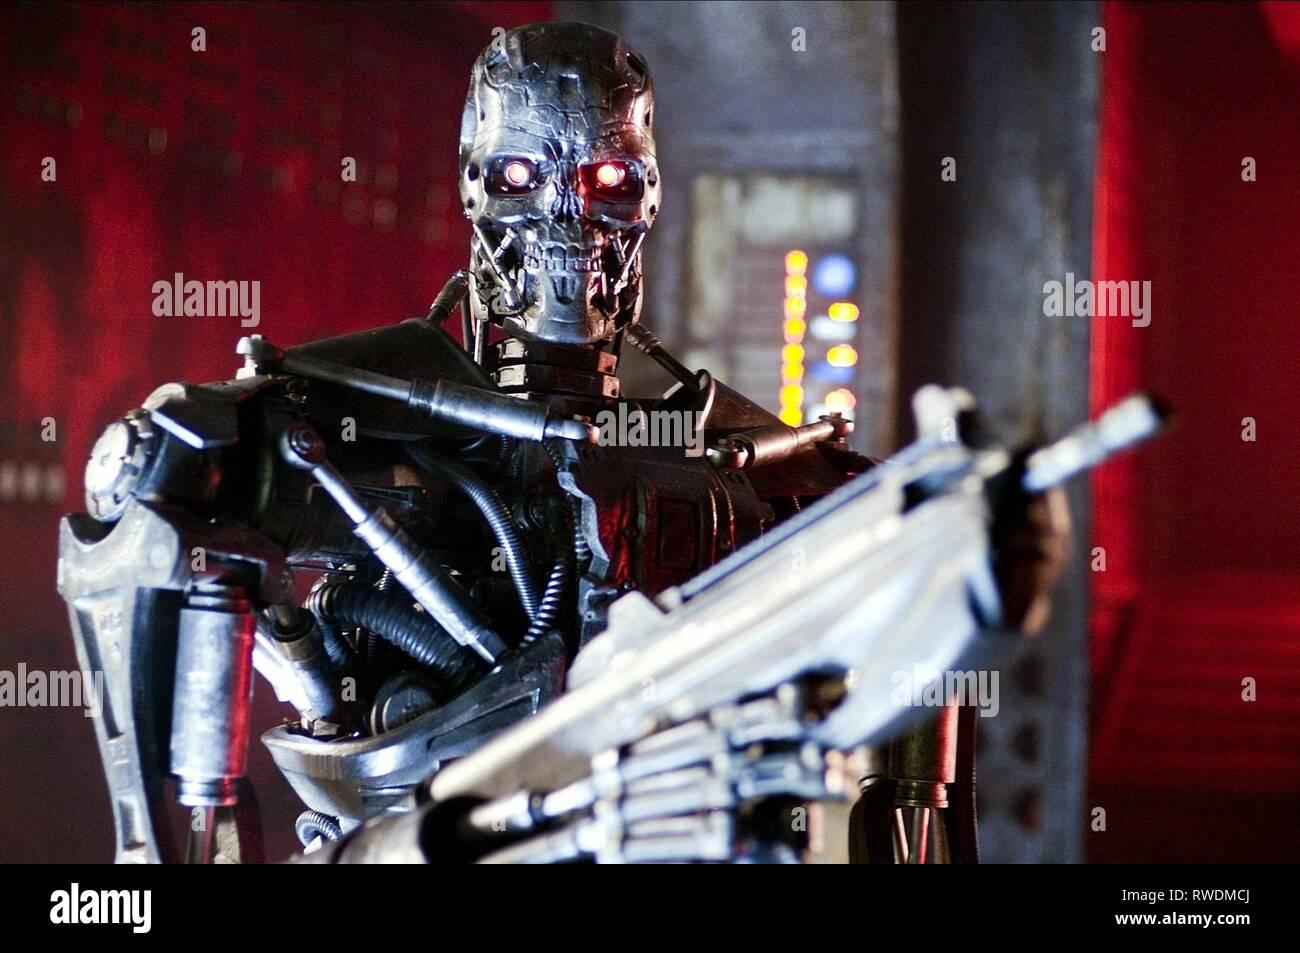 T Series Terminator Terminator Salvation 2009 Stock Photo Alamy